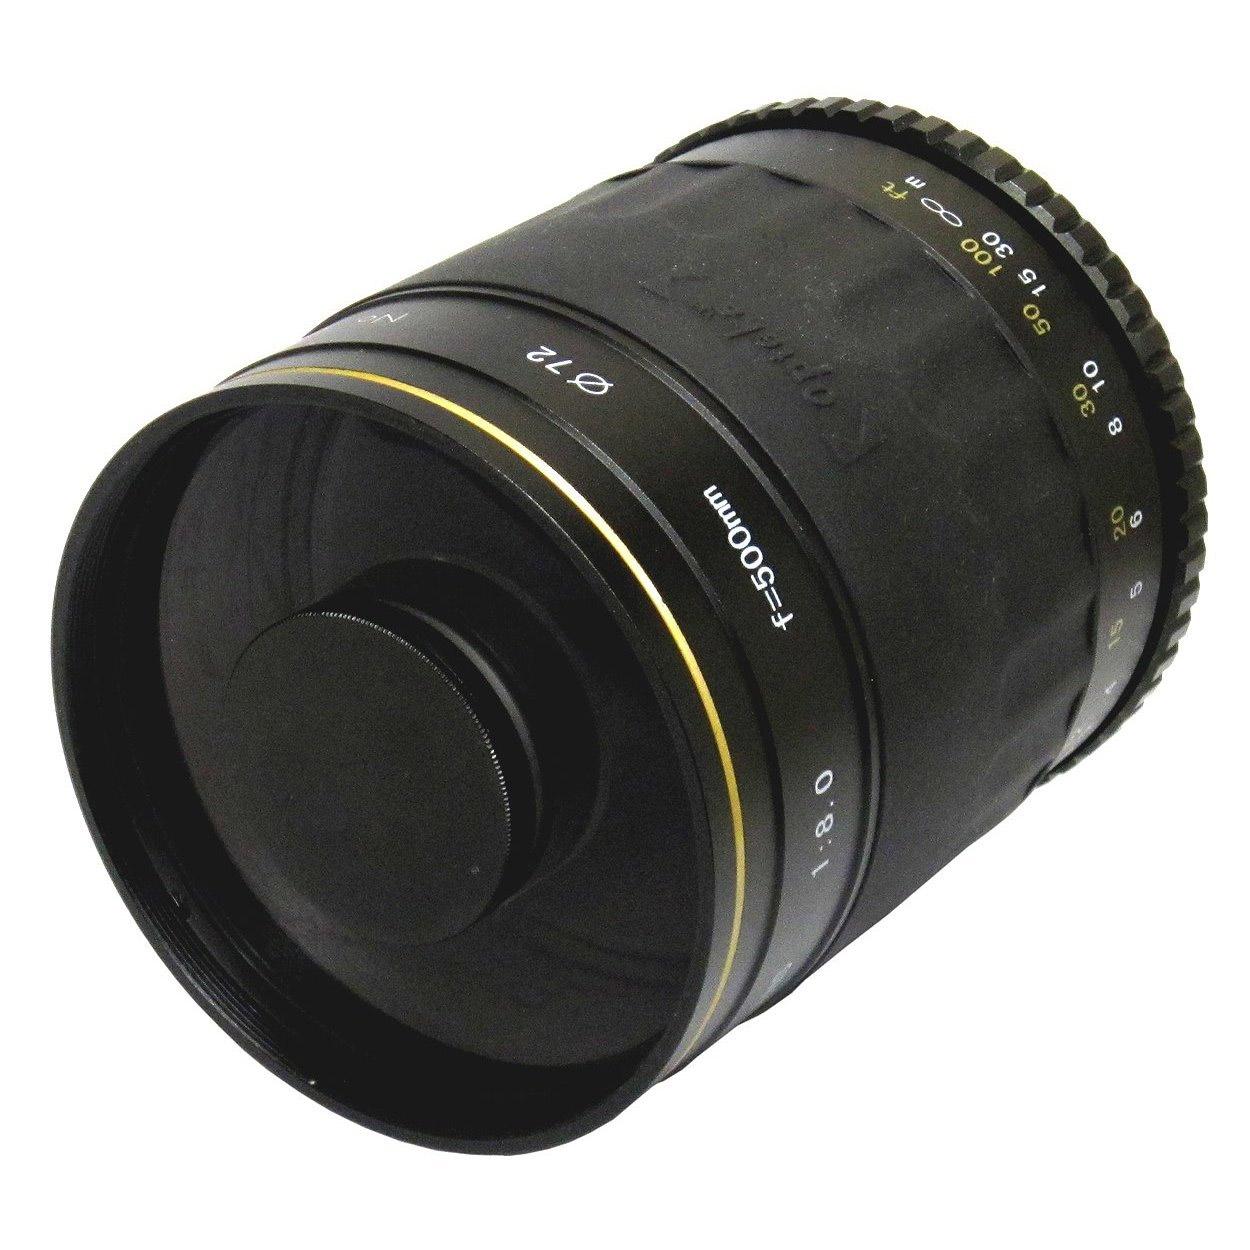 Spiegellen Bad it as a pro lens review opteka 500mm f 8 mirror lens